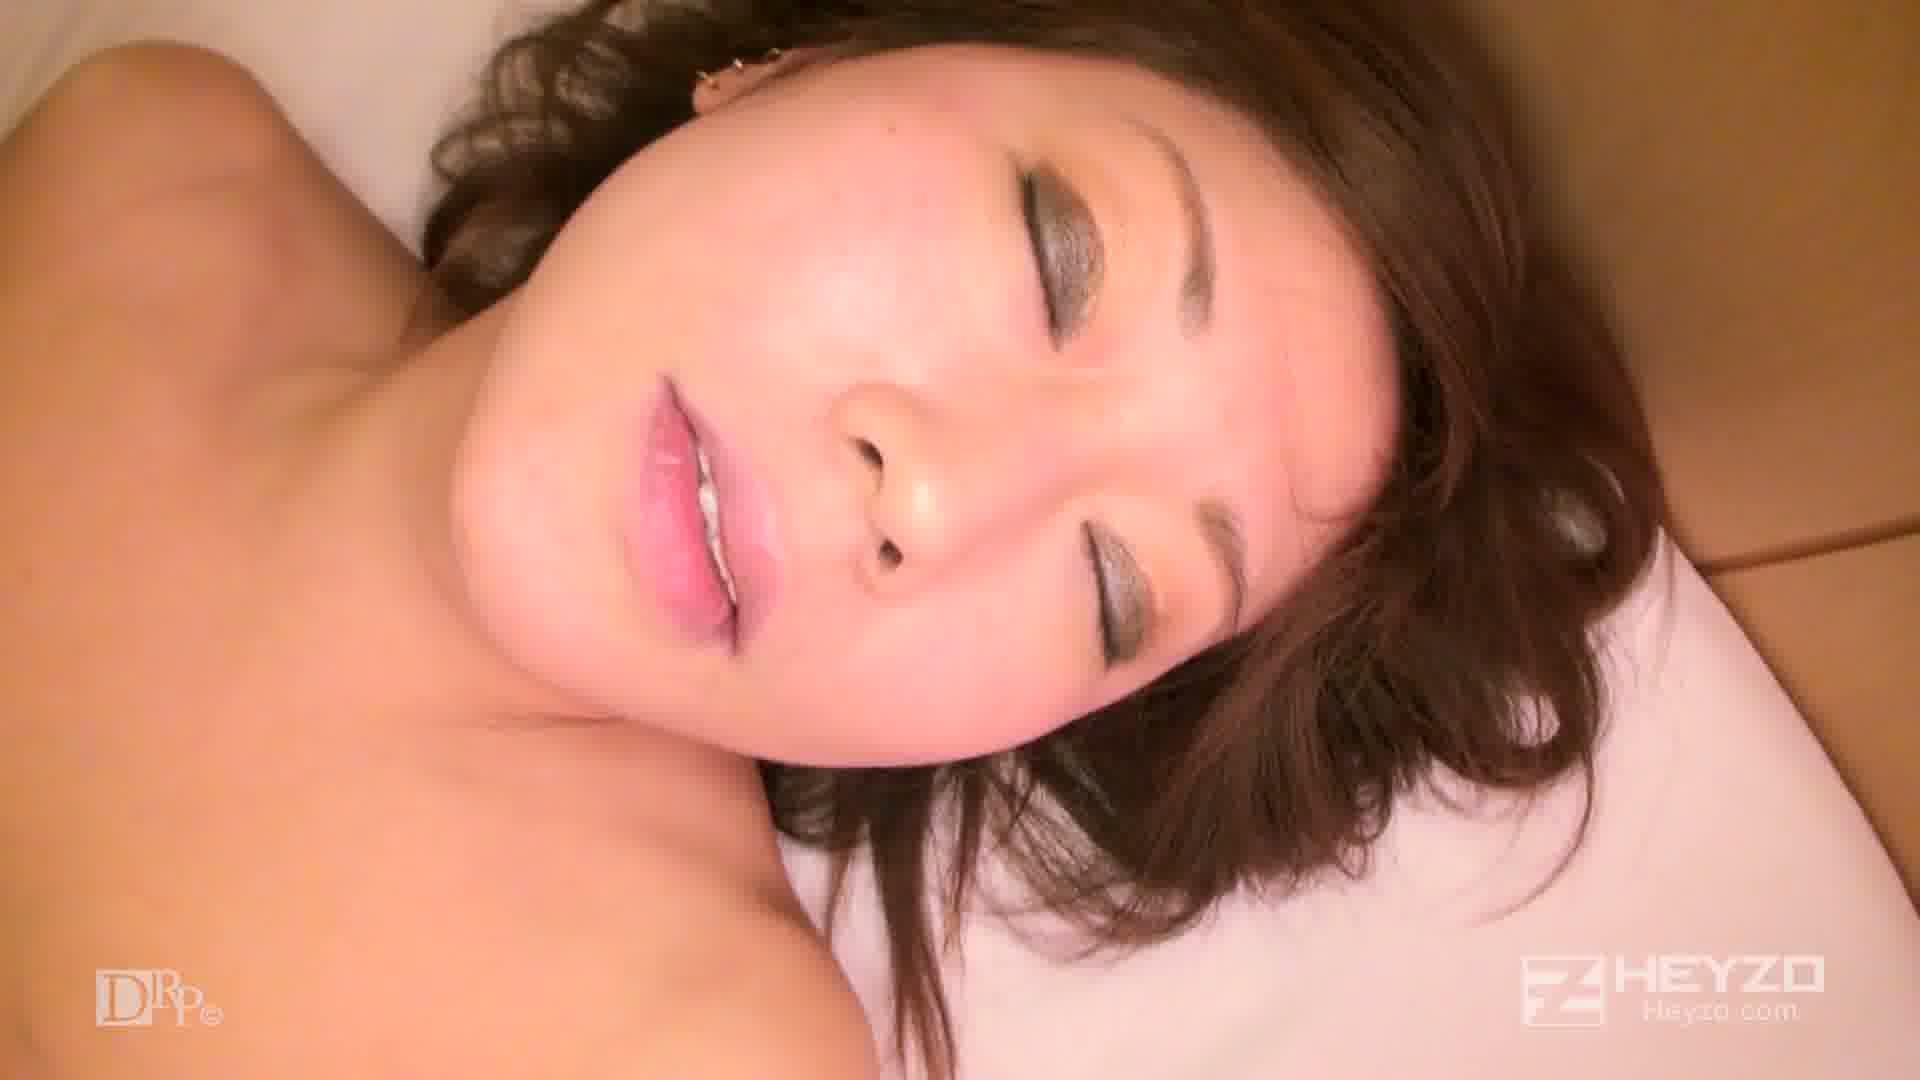 HAMEZO~ハメ撮りコレクション~vol.29 - 西原美鈴【バック 騎乗位 座位 指マン 正常位】